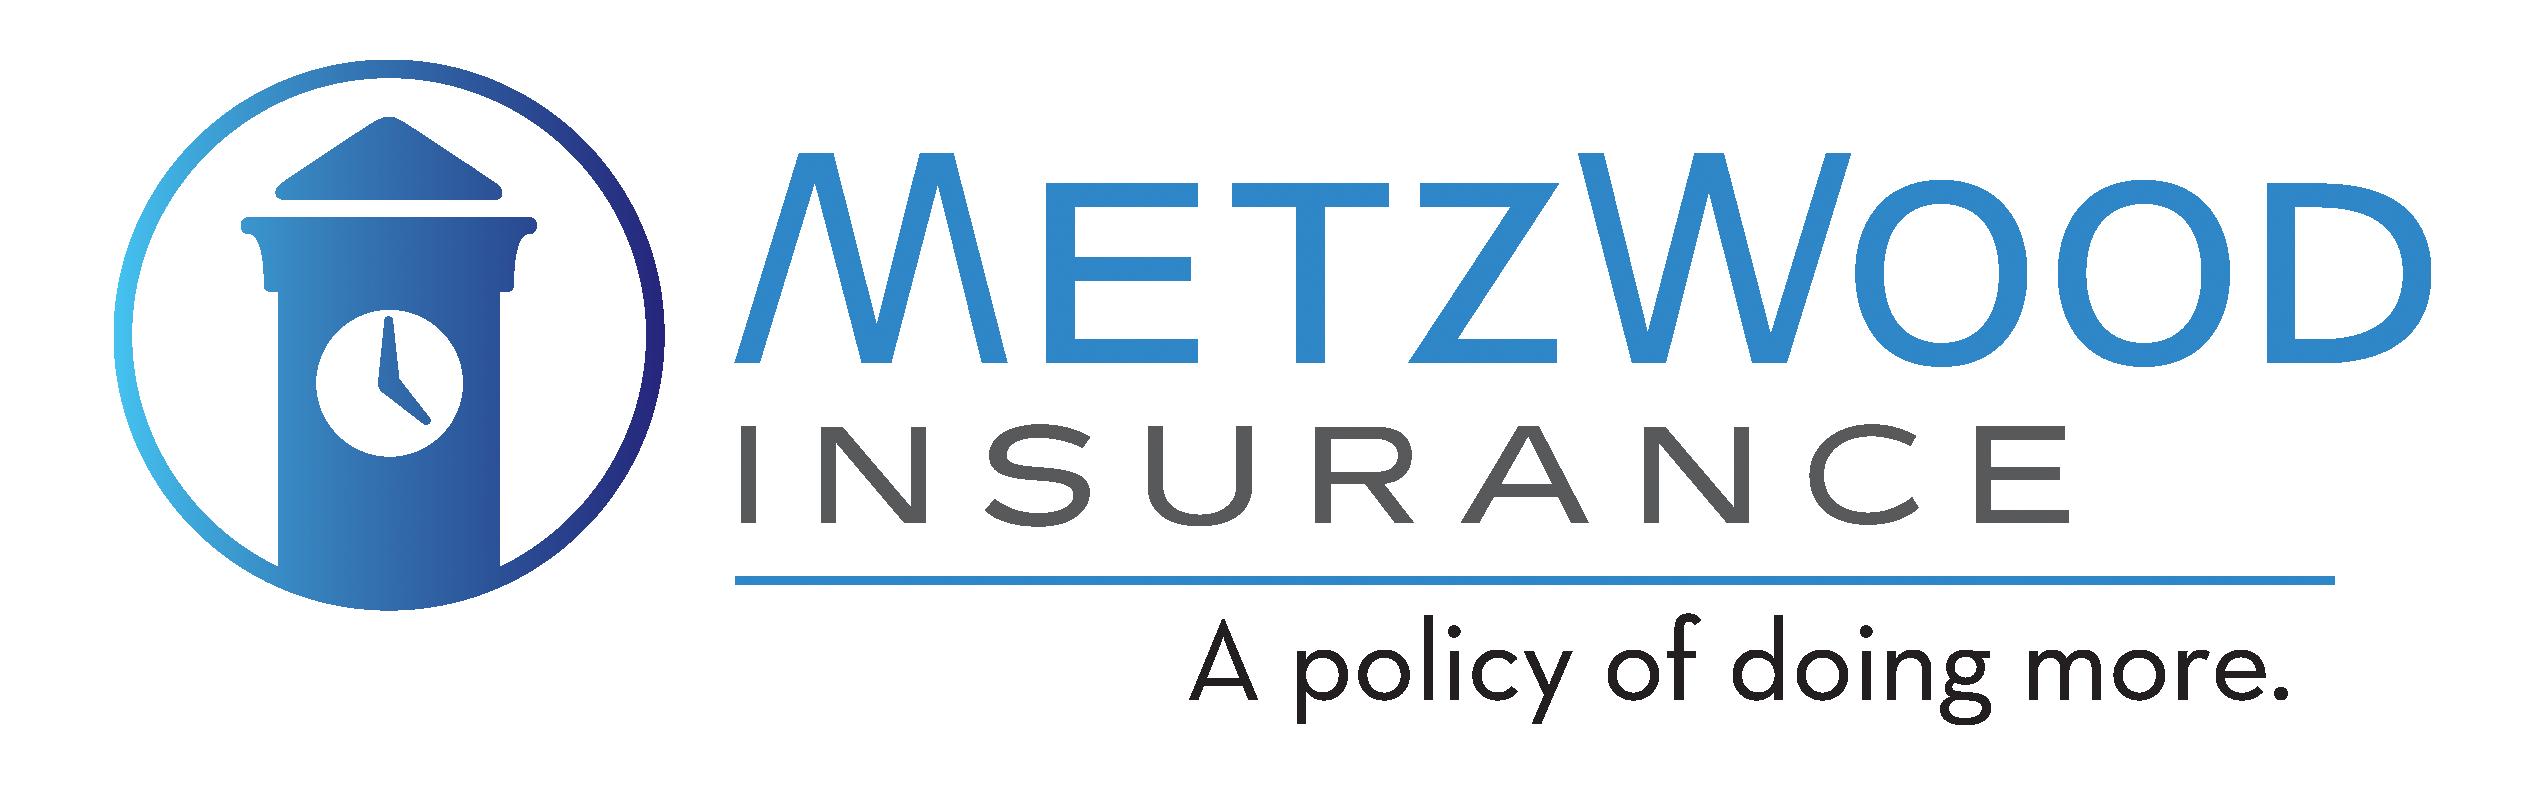 MetzWood Insurance